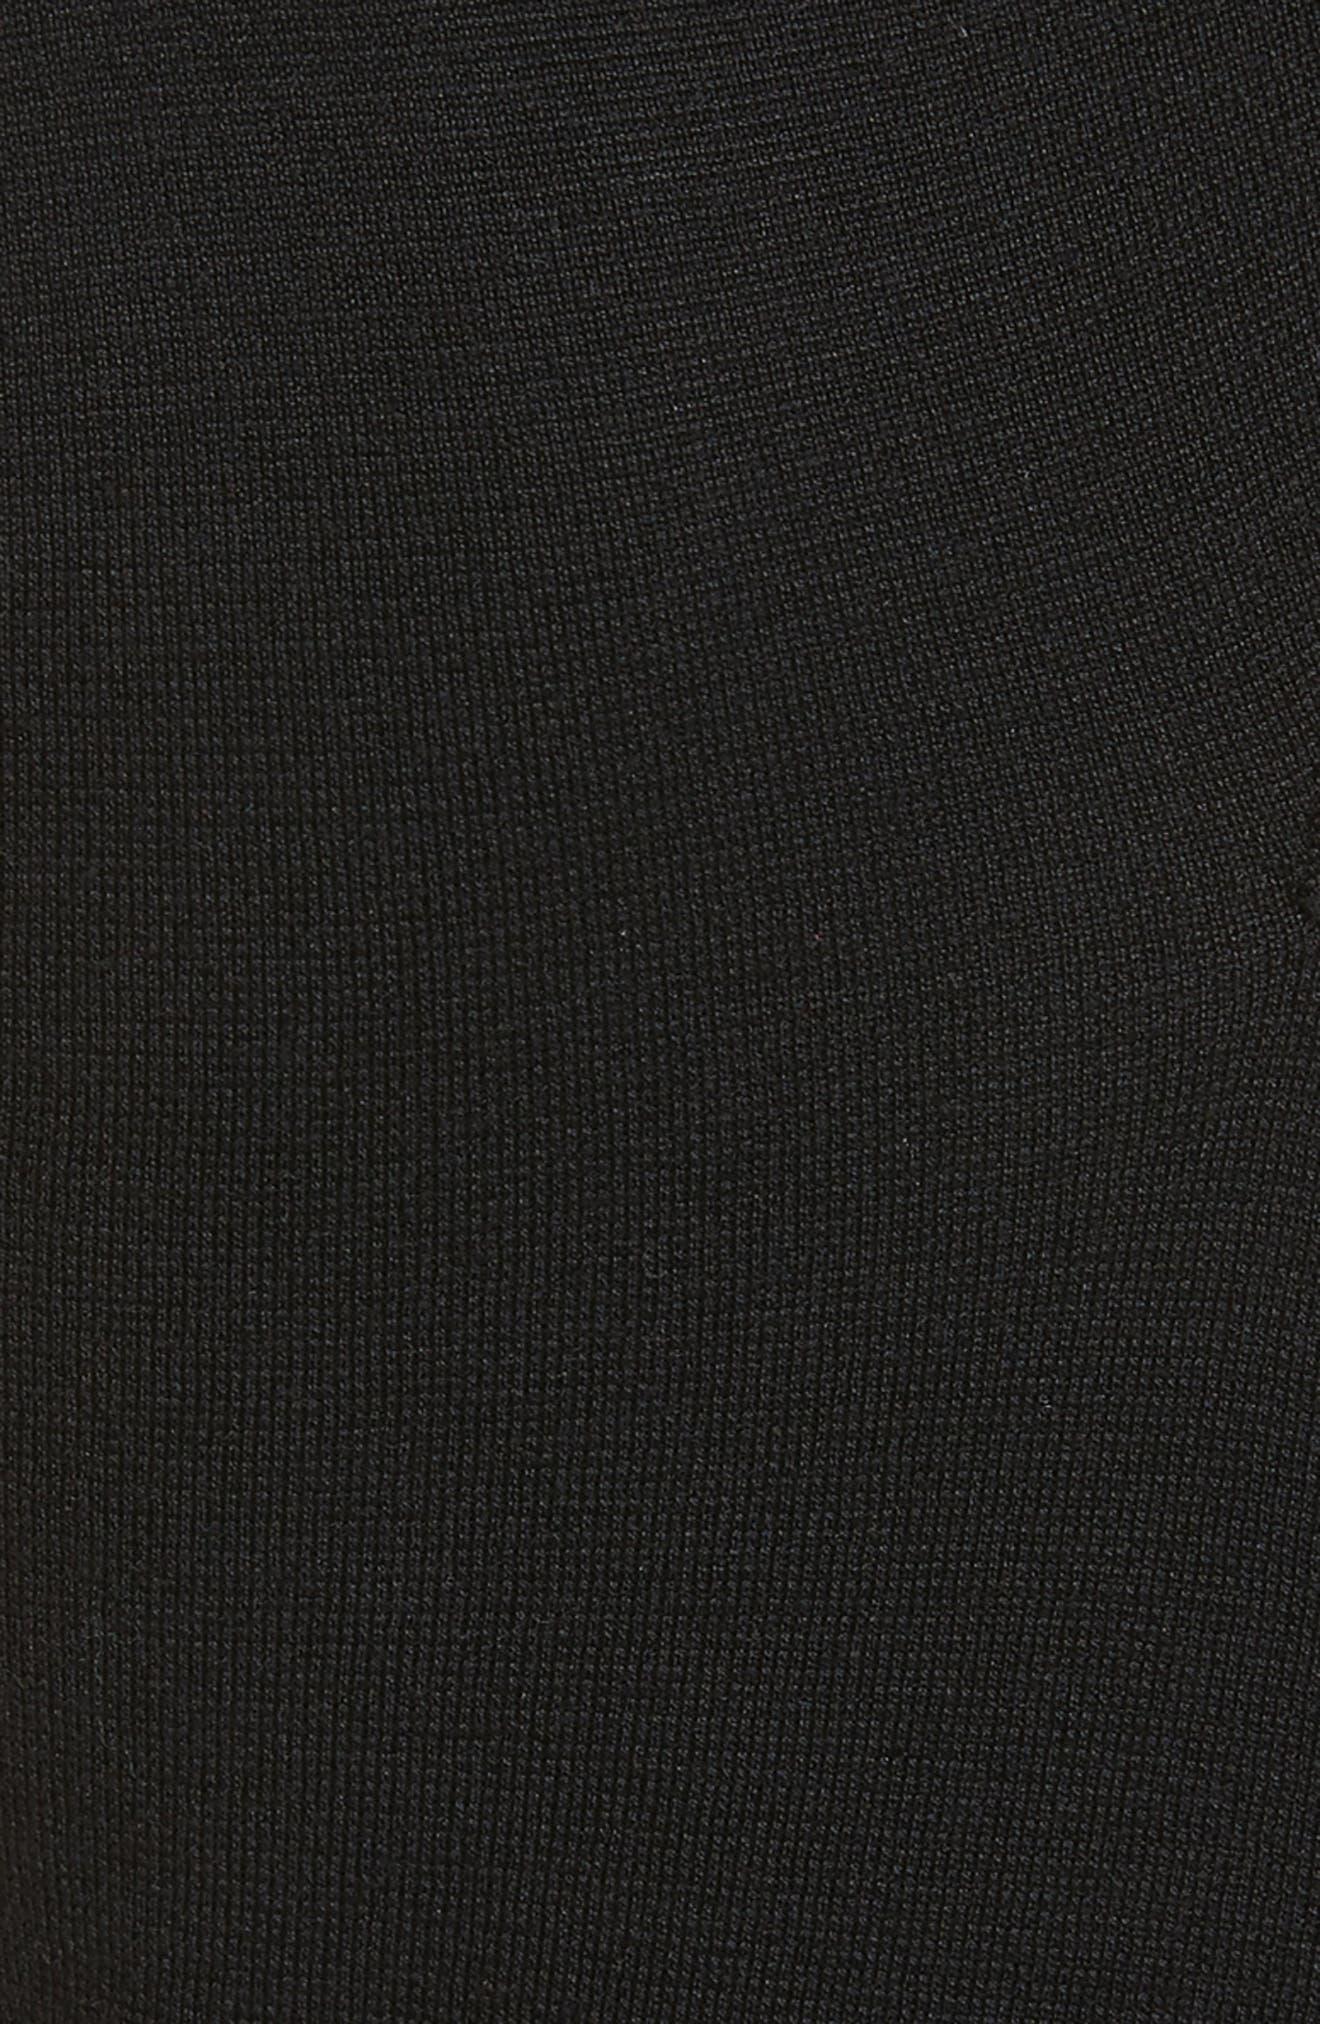 Asymmetrical Knit Tunic,                             Alternate thumbnail 5, color,                             001